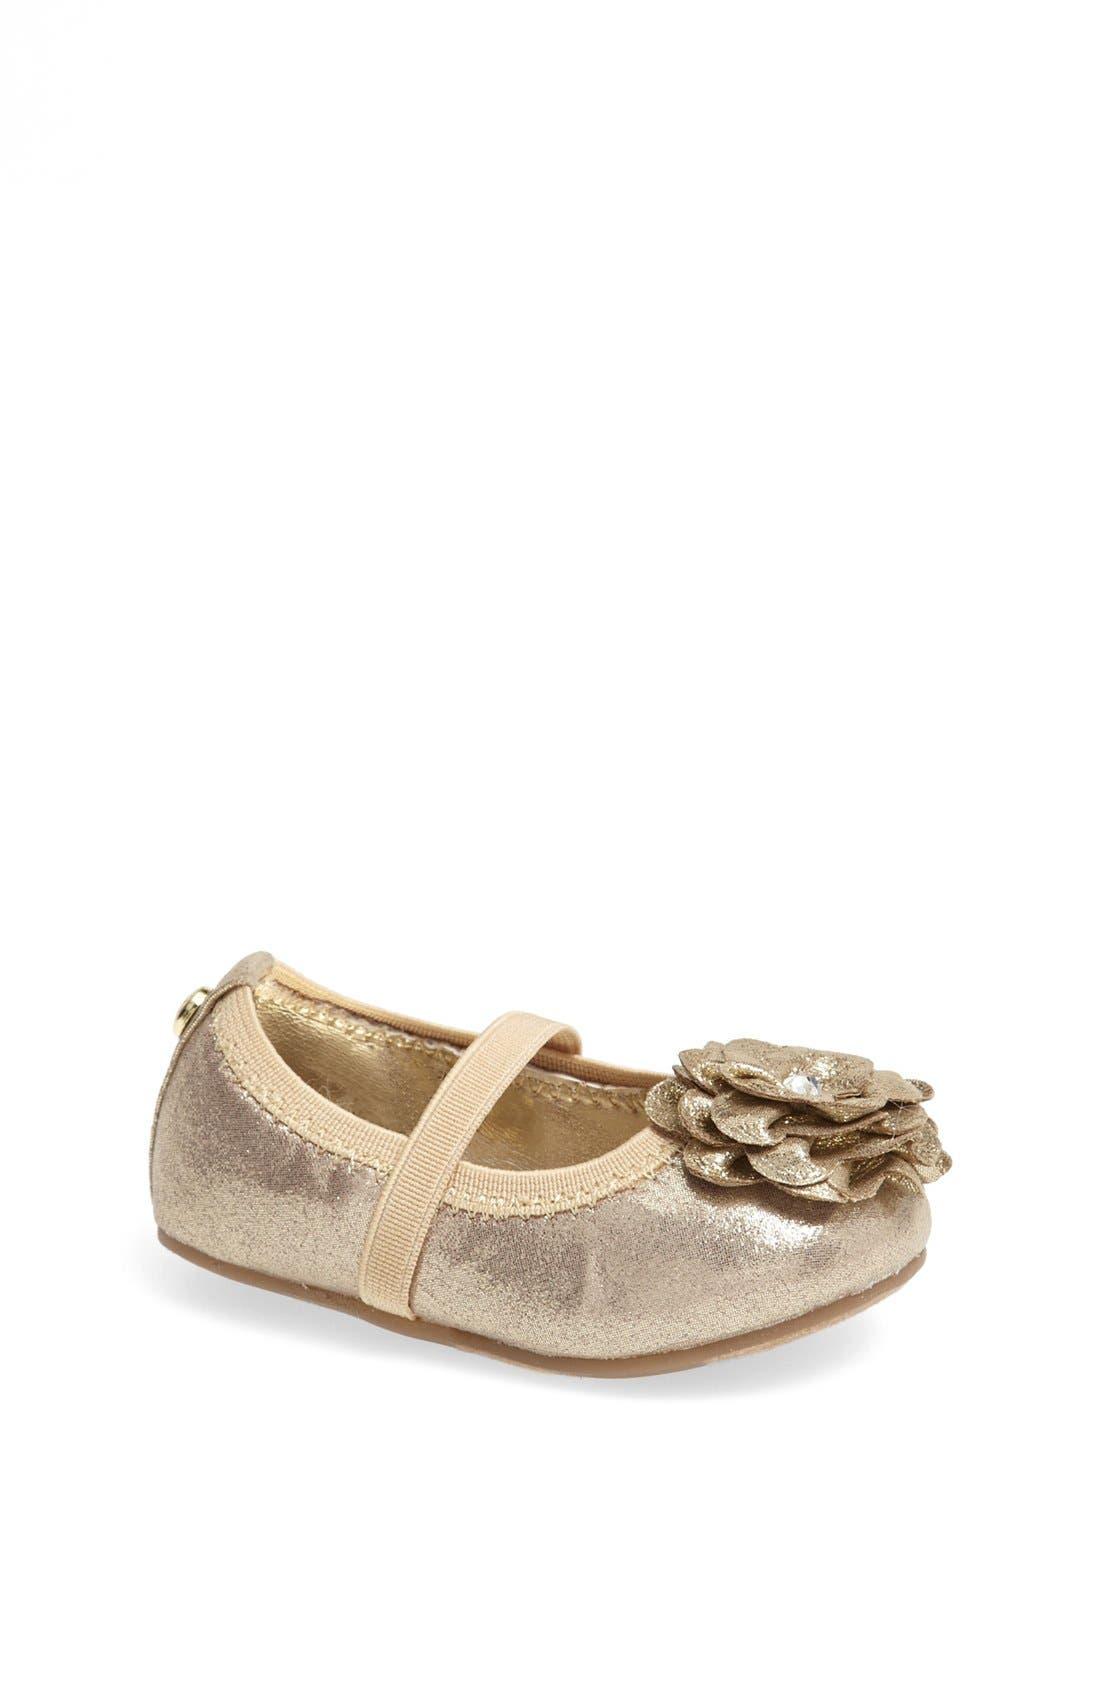 Main Image - Stuart Weitzman 'Pali' Crib Shoe (Baby)